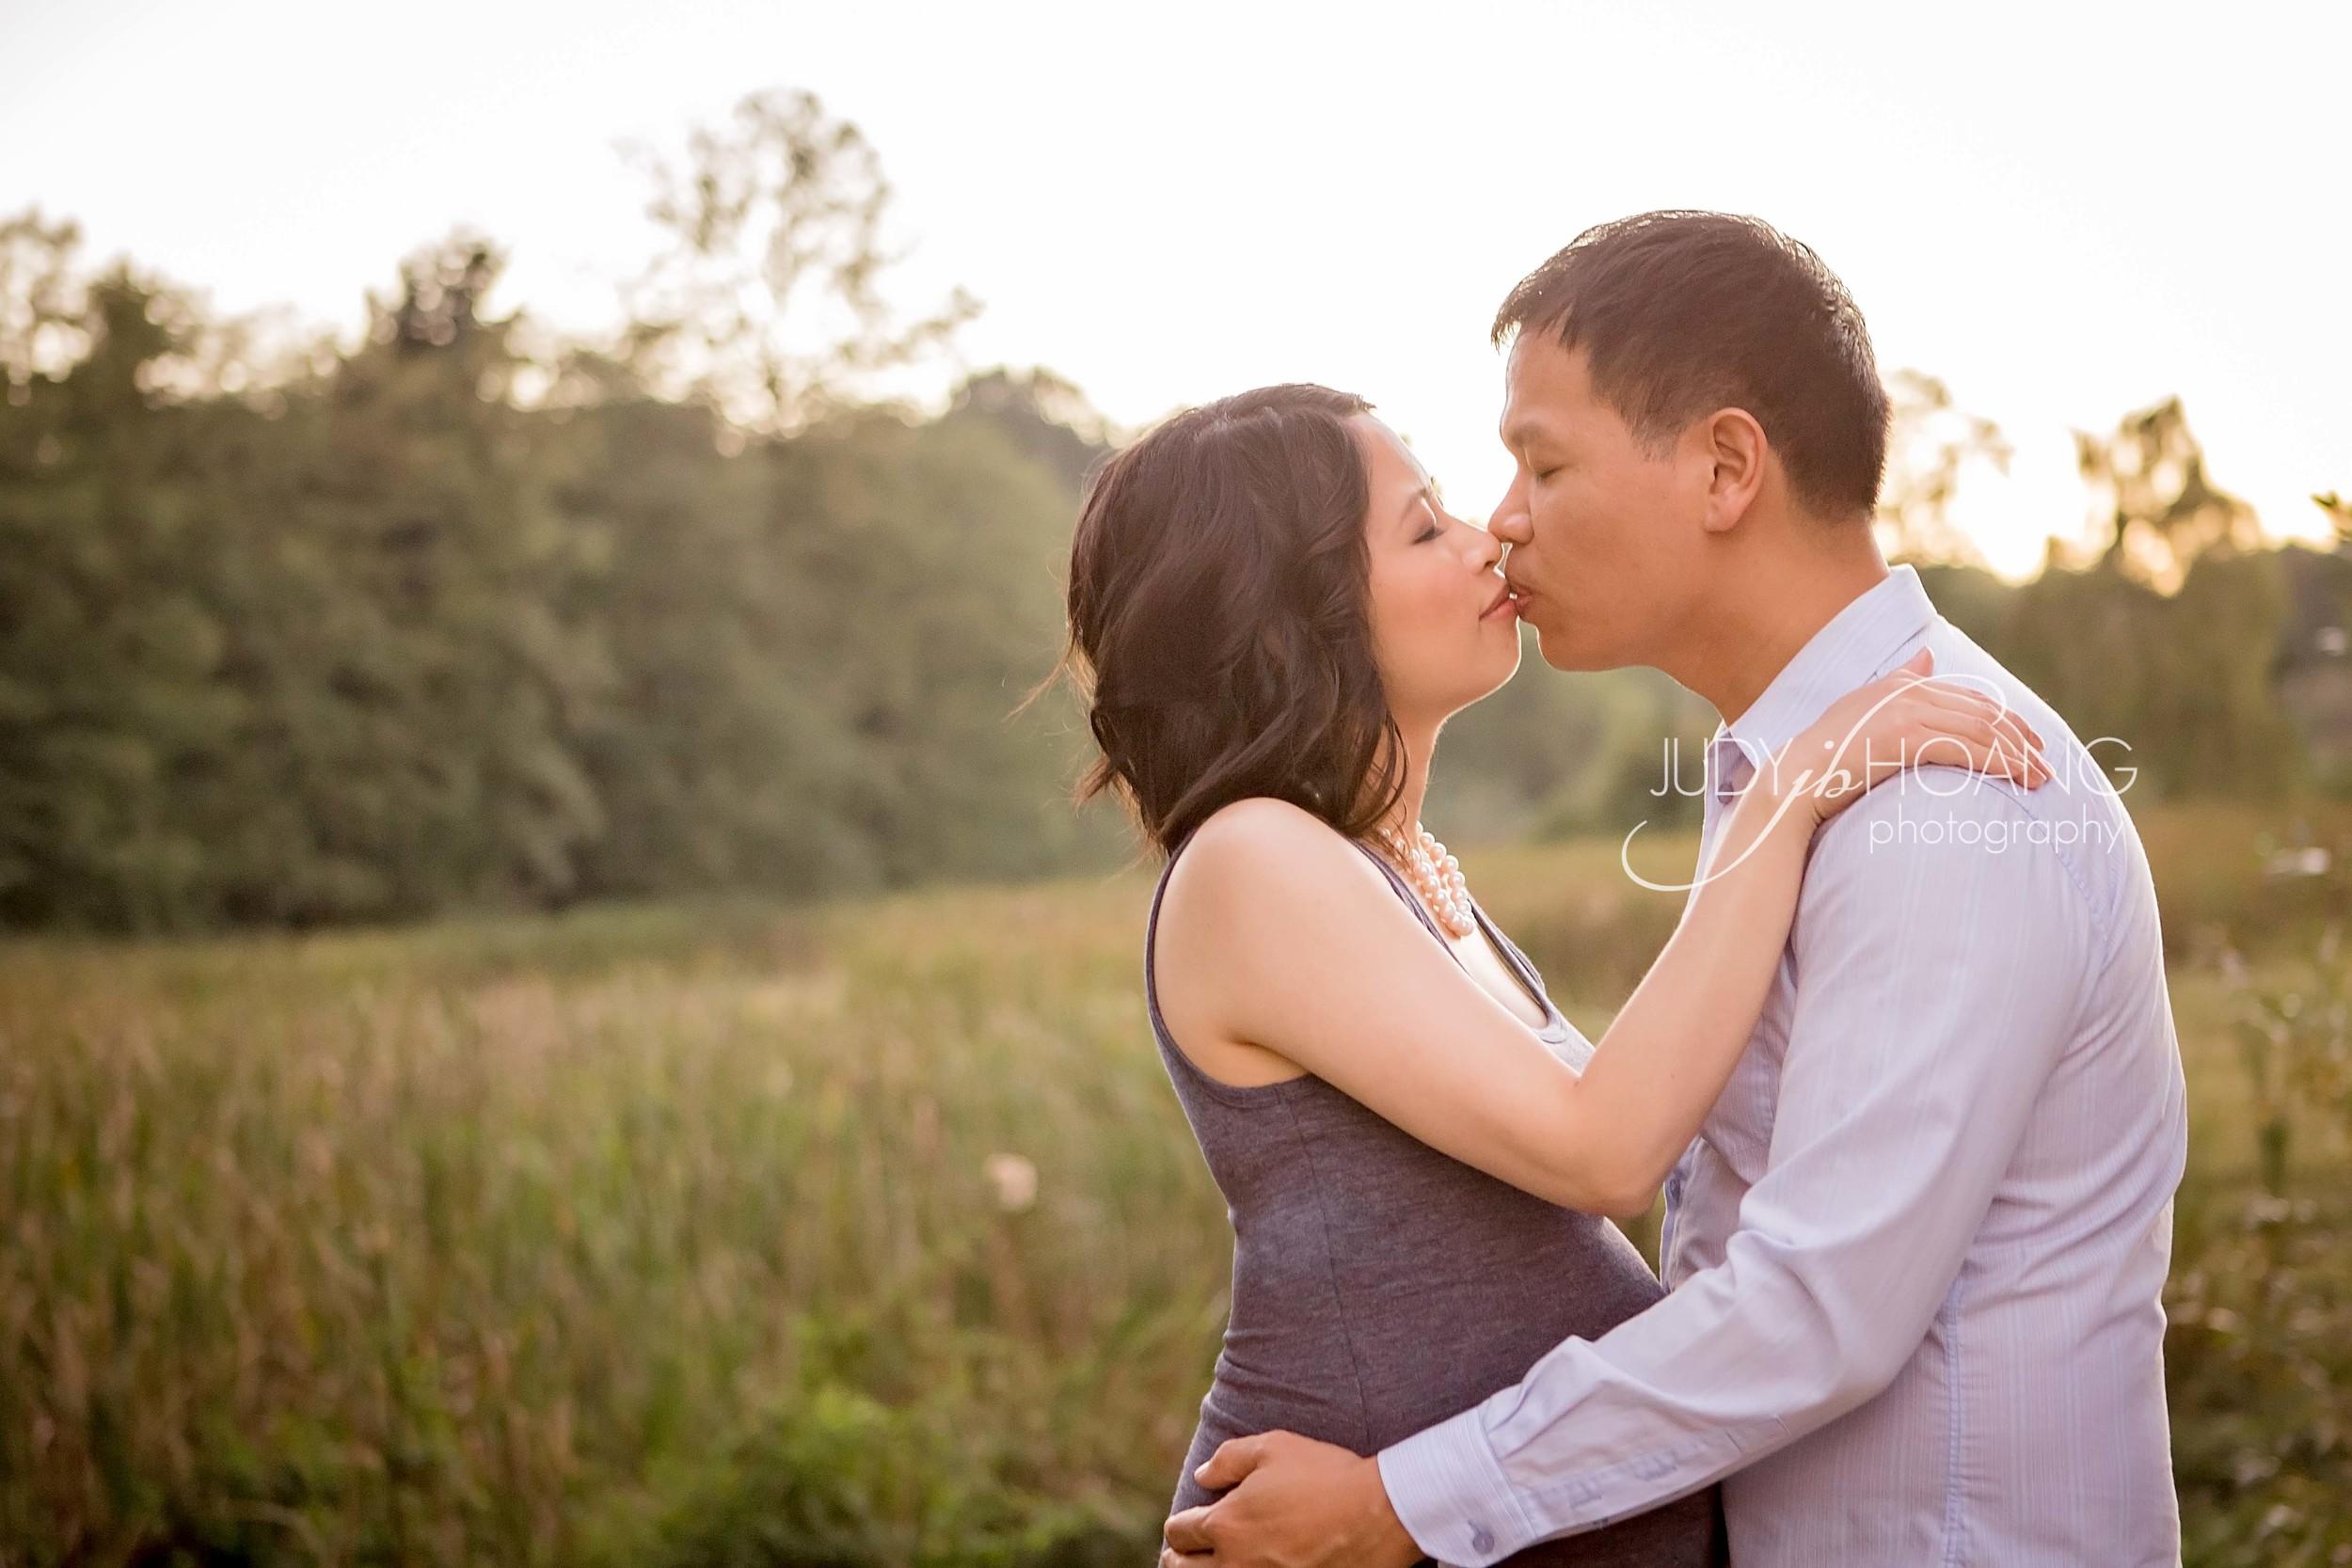 Judy Hoang Photography - Outdoor Maternity-3.JPG